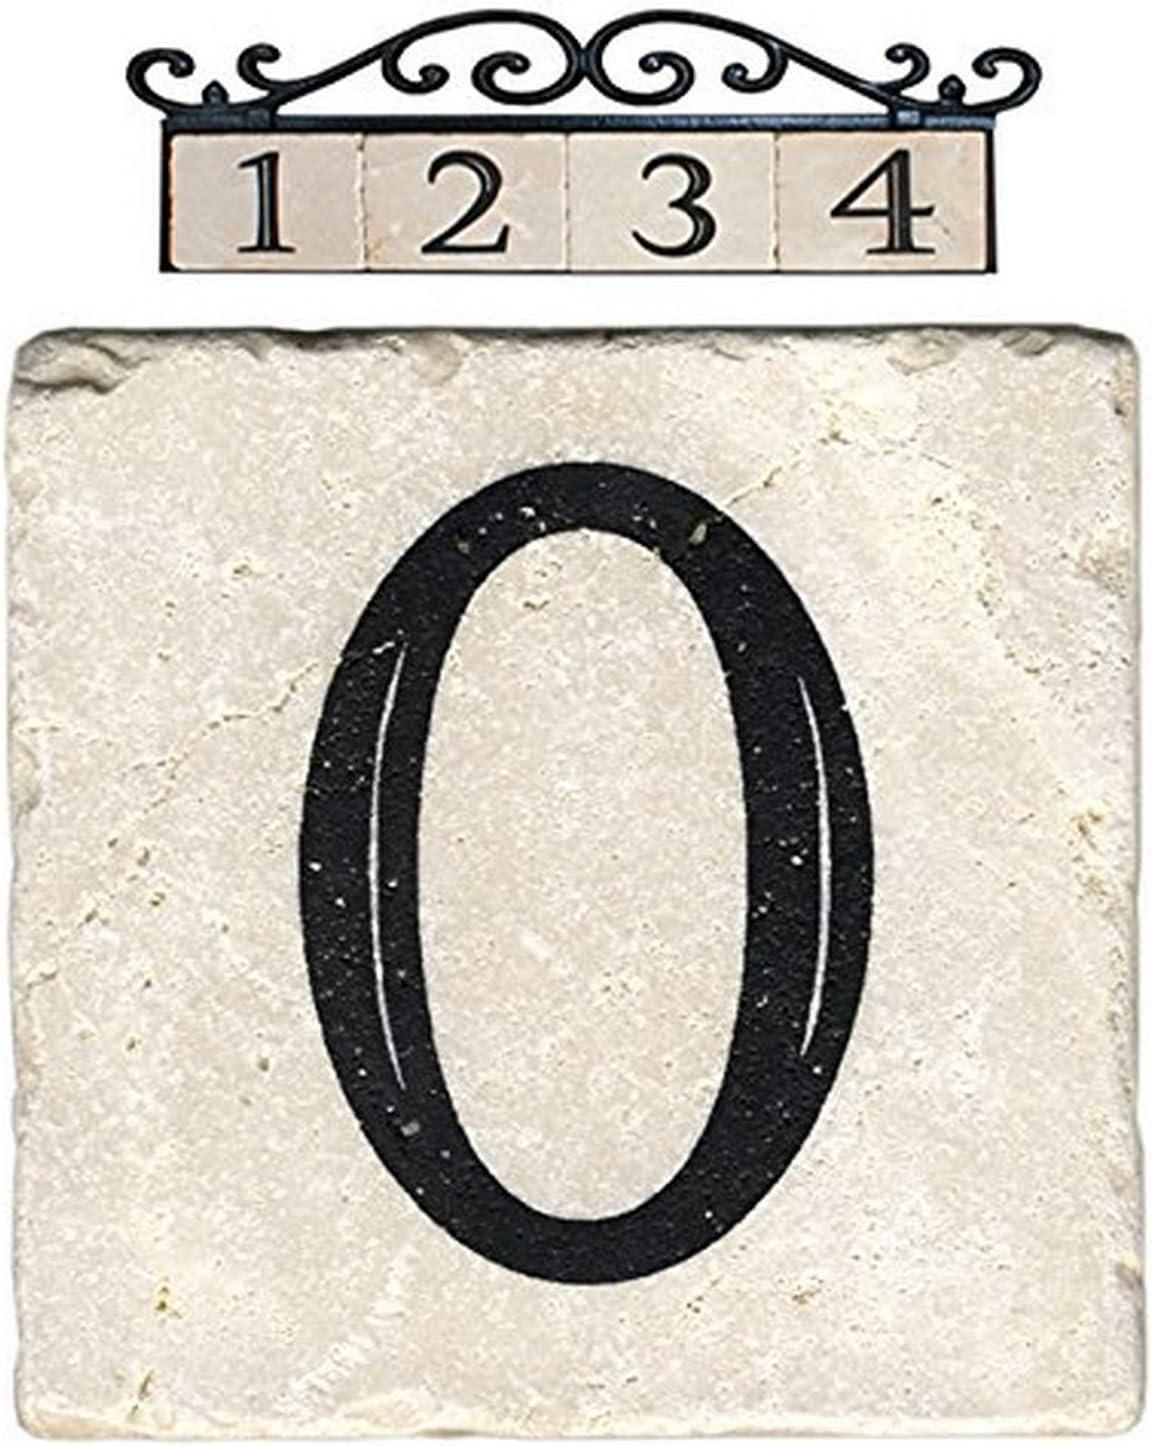 NACH AZ-CLASSIC House Address Number Tiles - #0, Marble/Beige, 4 x 4